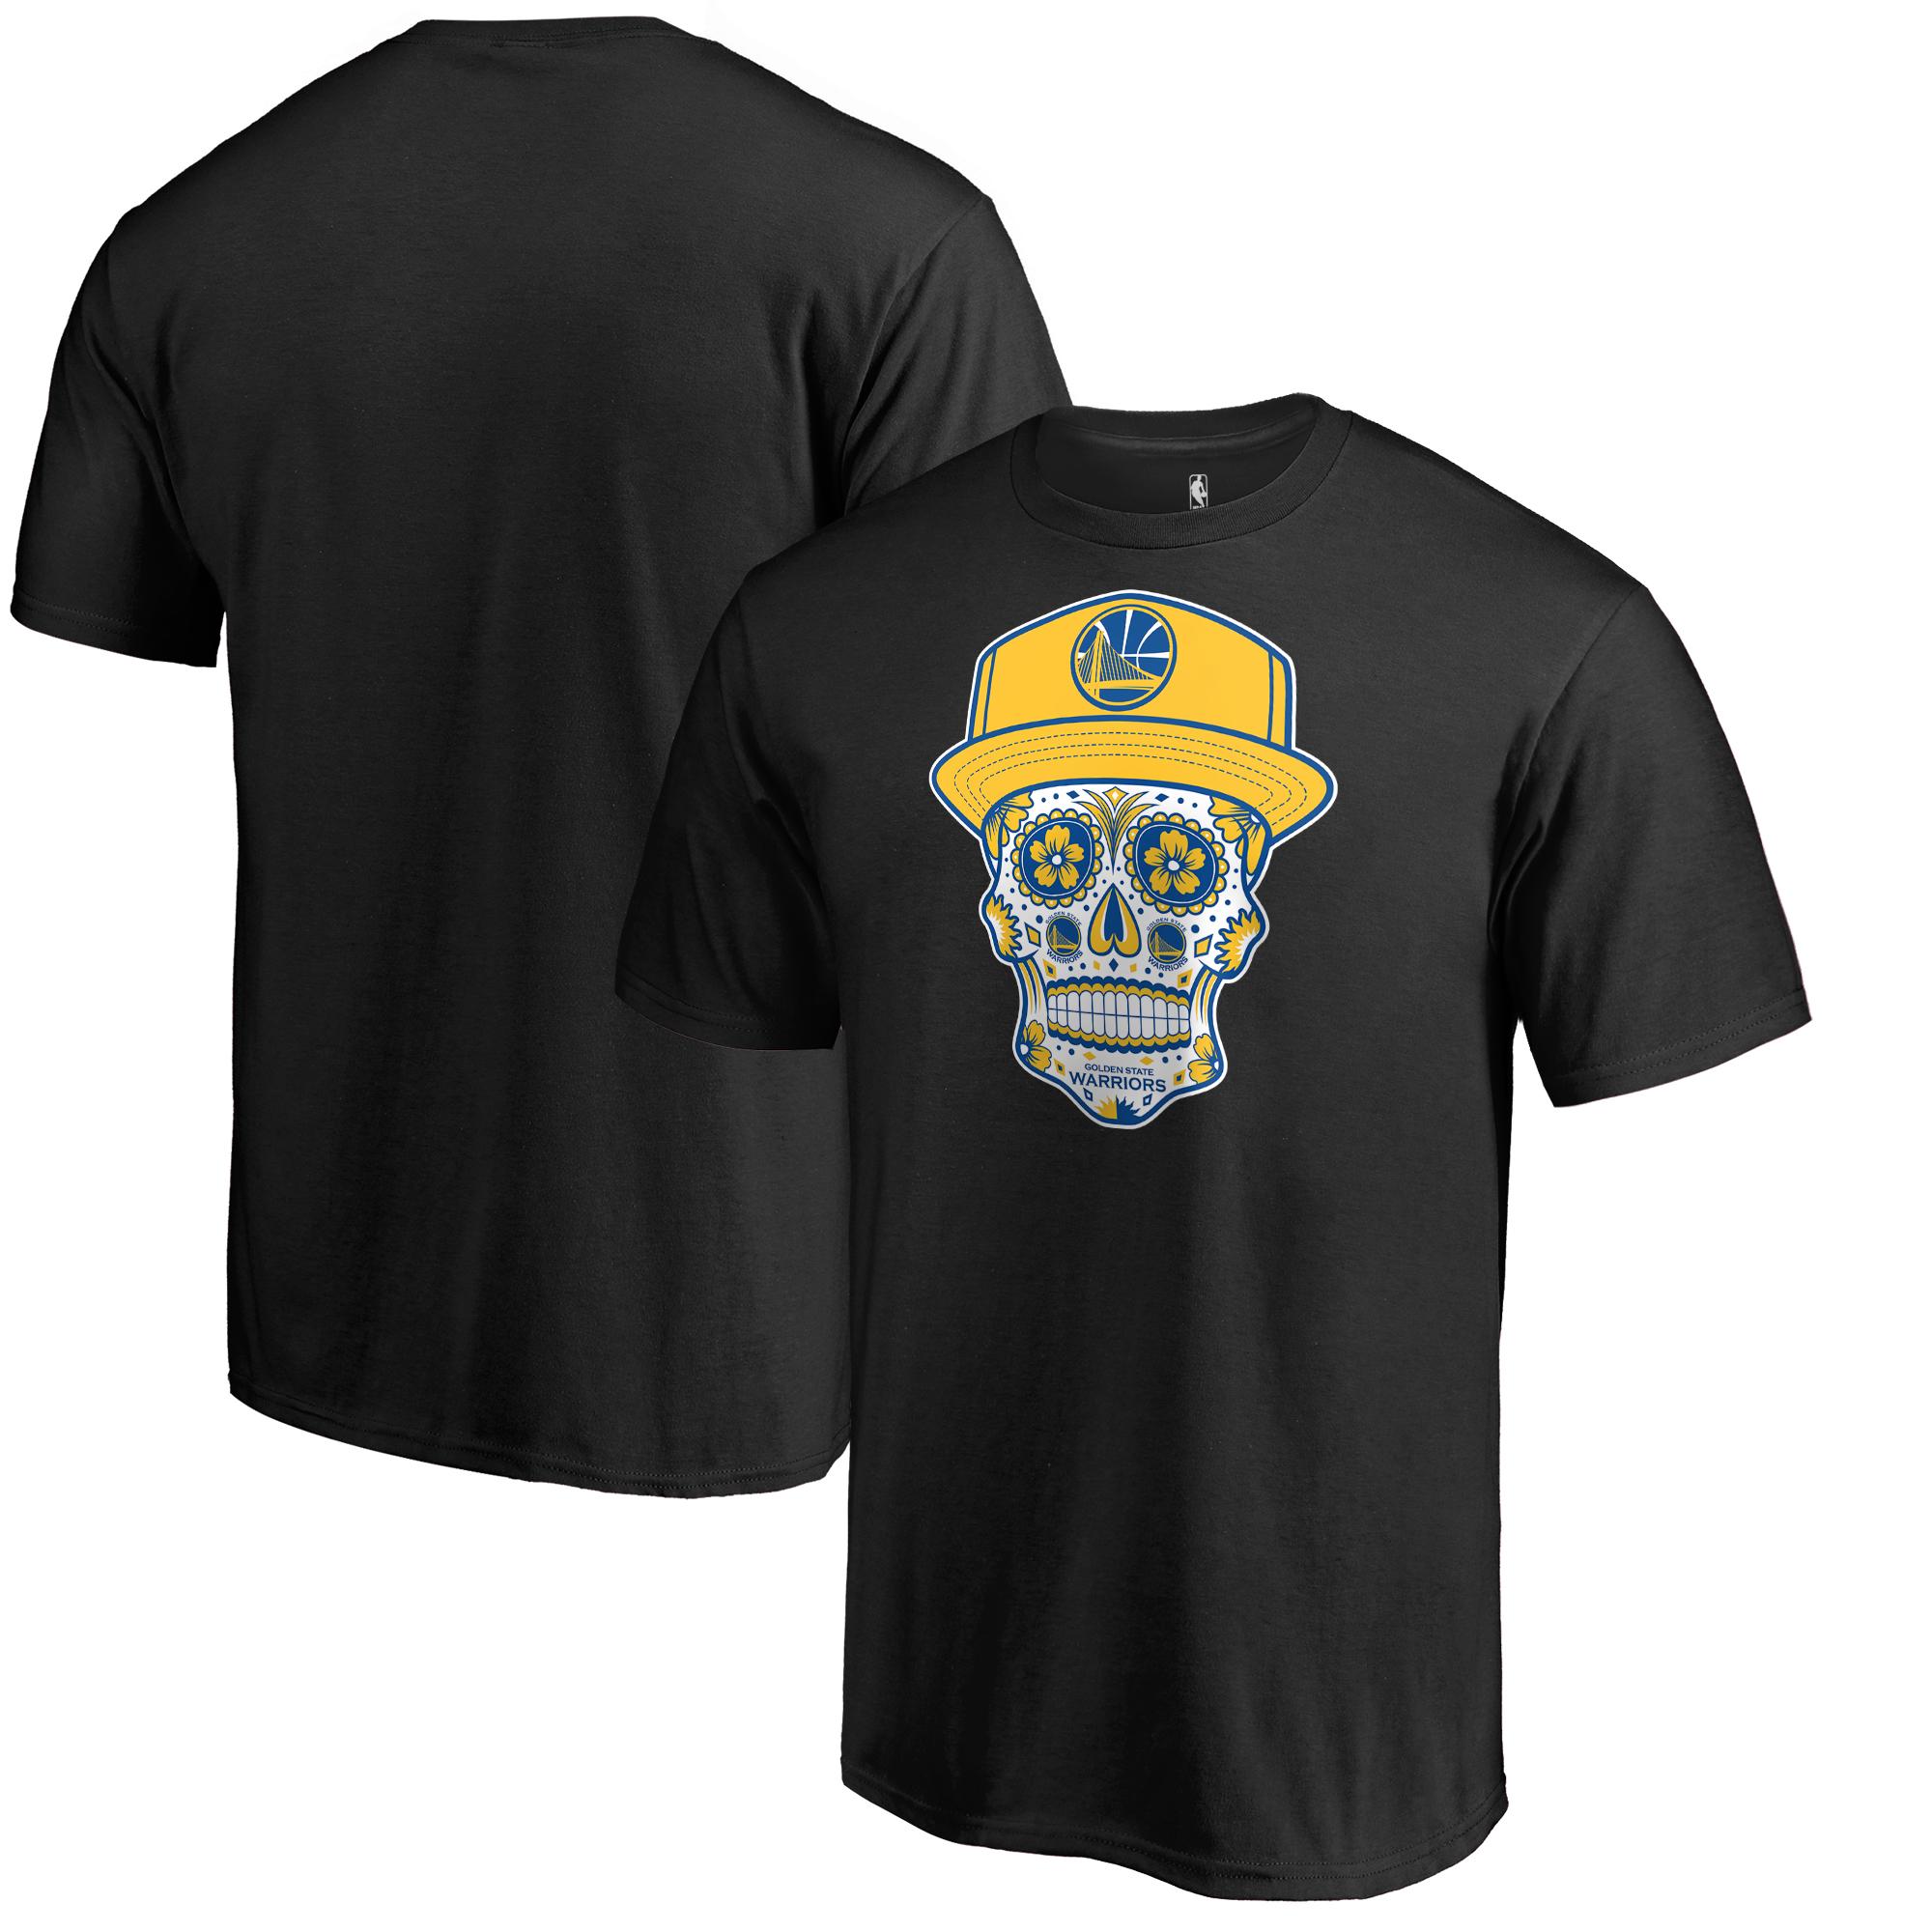 Golden State Warriors Fanatics Branded Hometown Collection Sugar Skull Alternate T-Shirt - Black